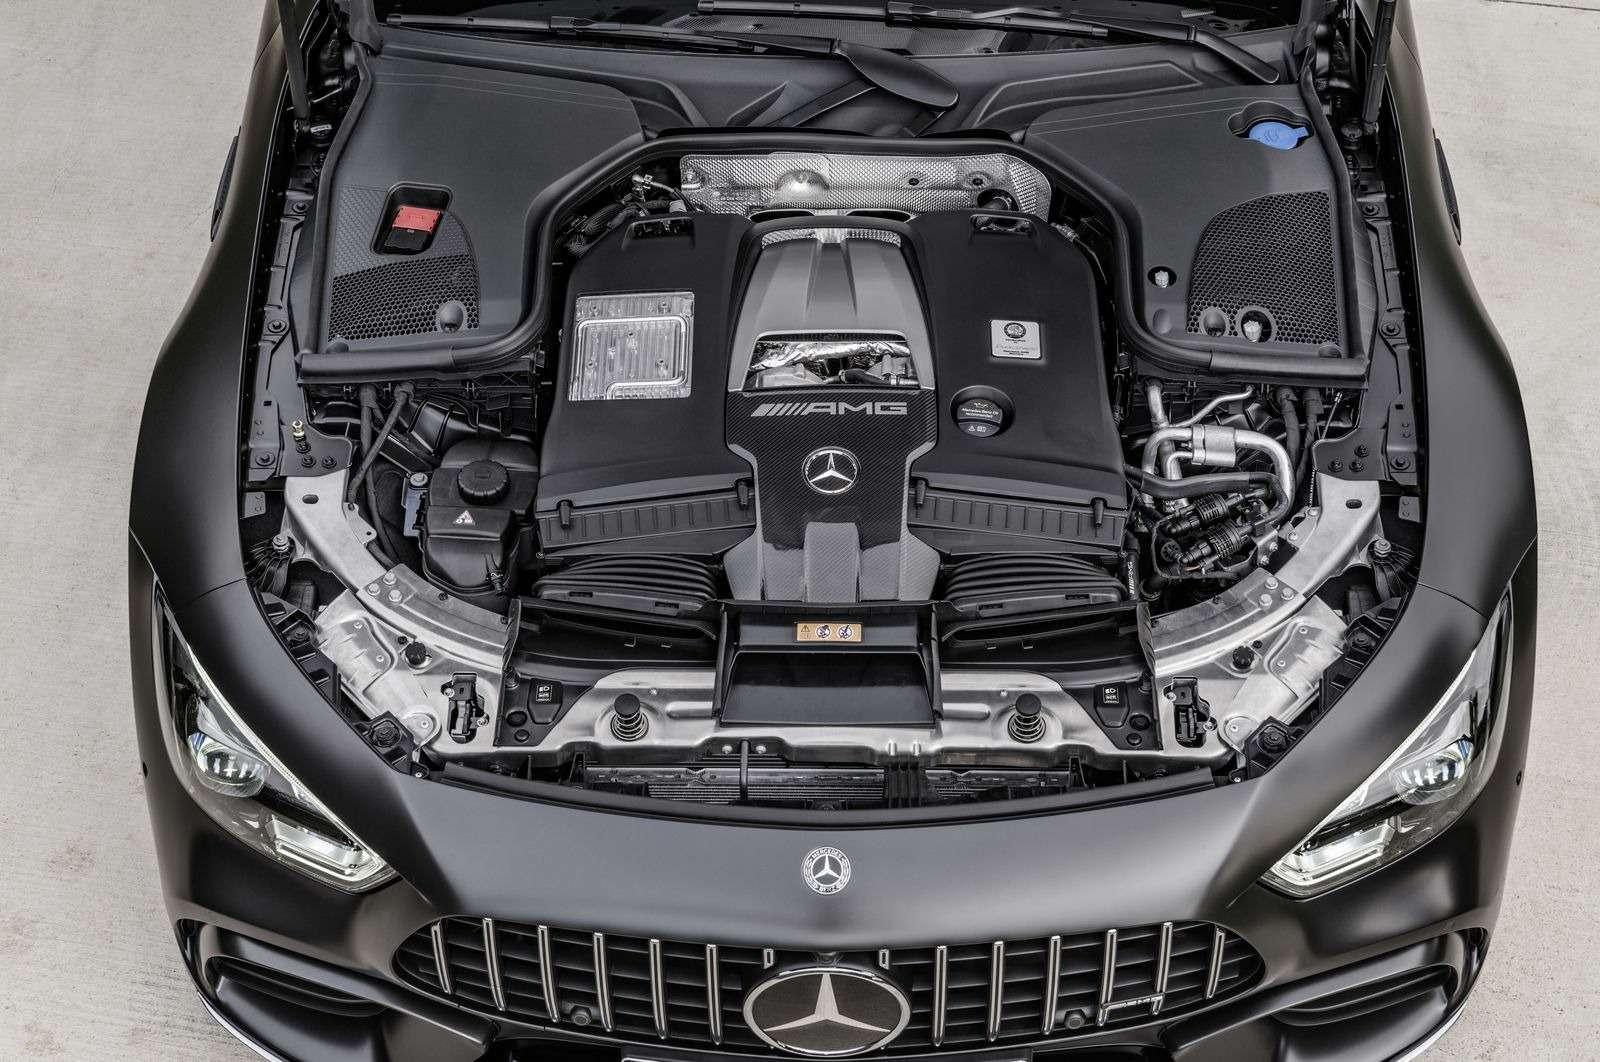 Подмена! Пятидверный Mercedes-AMG GTполучил «тележку» Е-класса— фото 851521